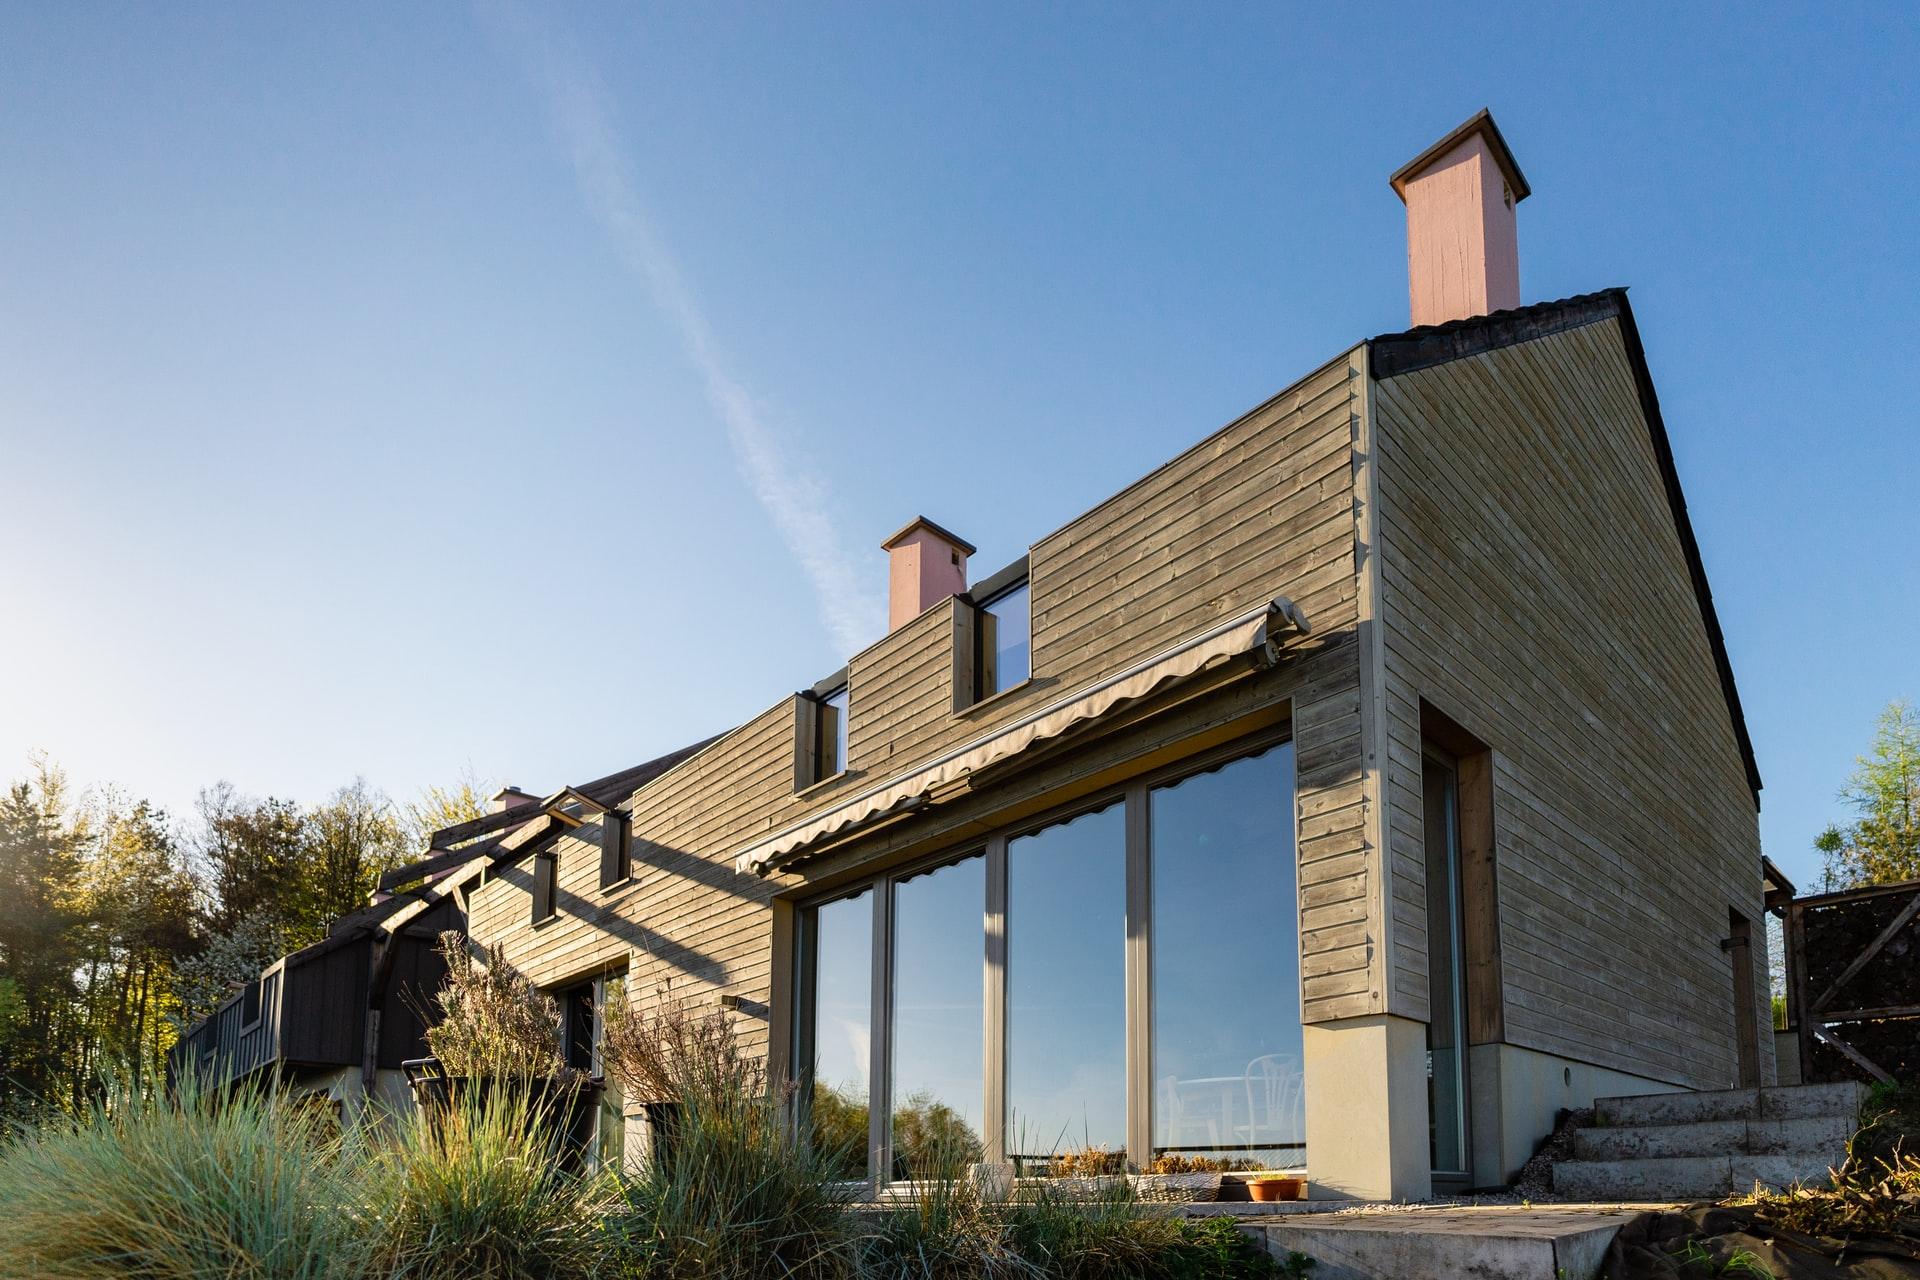 Haus mit Fassadenholz